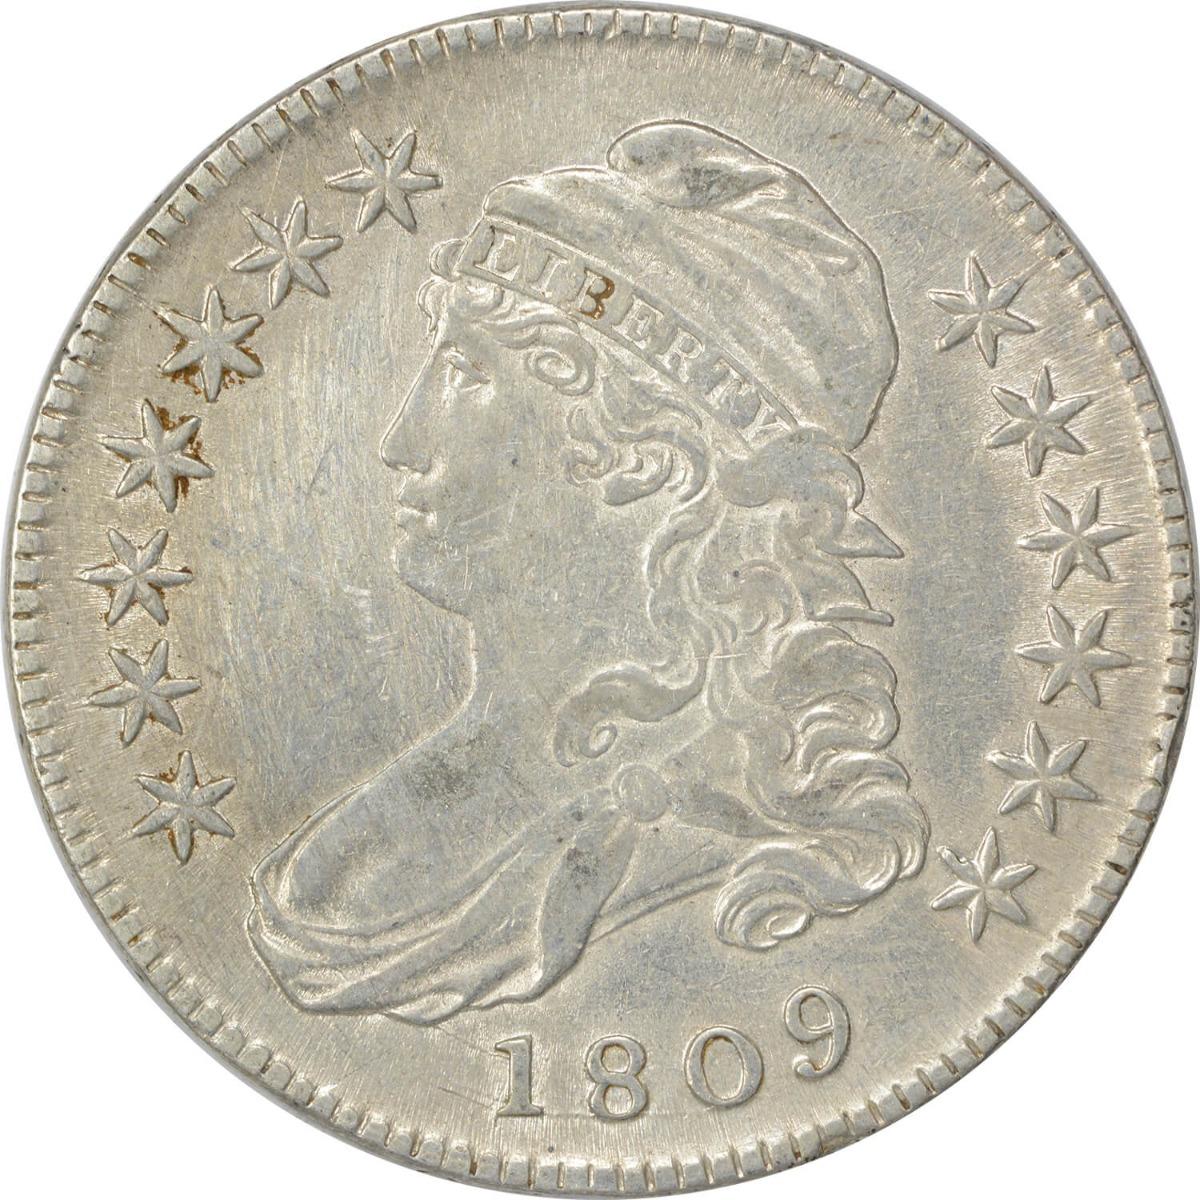 1809 Bust Half Dollar, EF, Uncertified